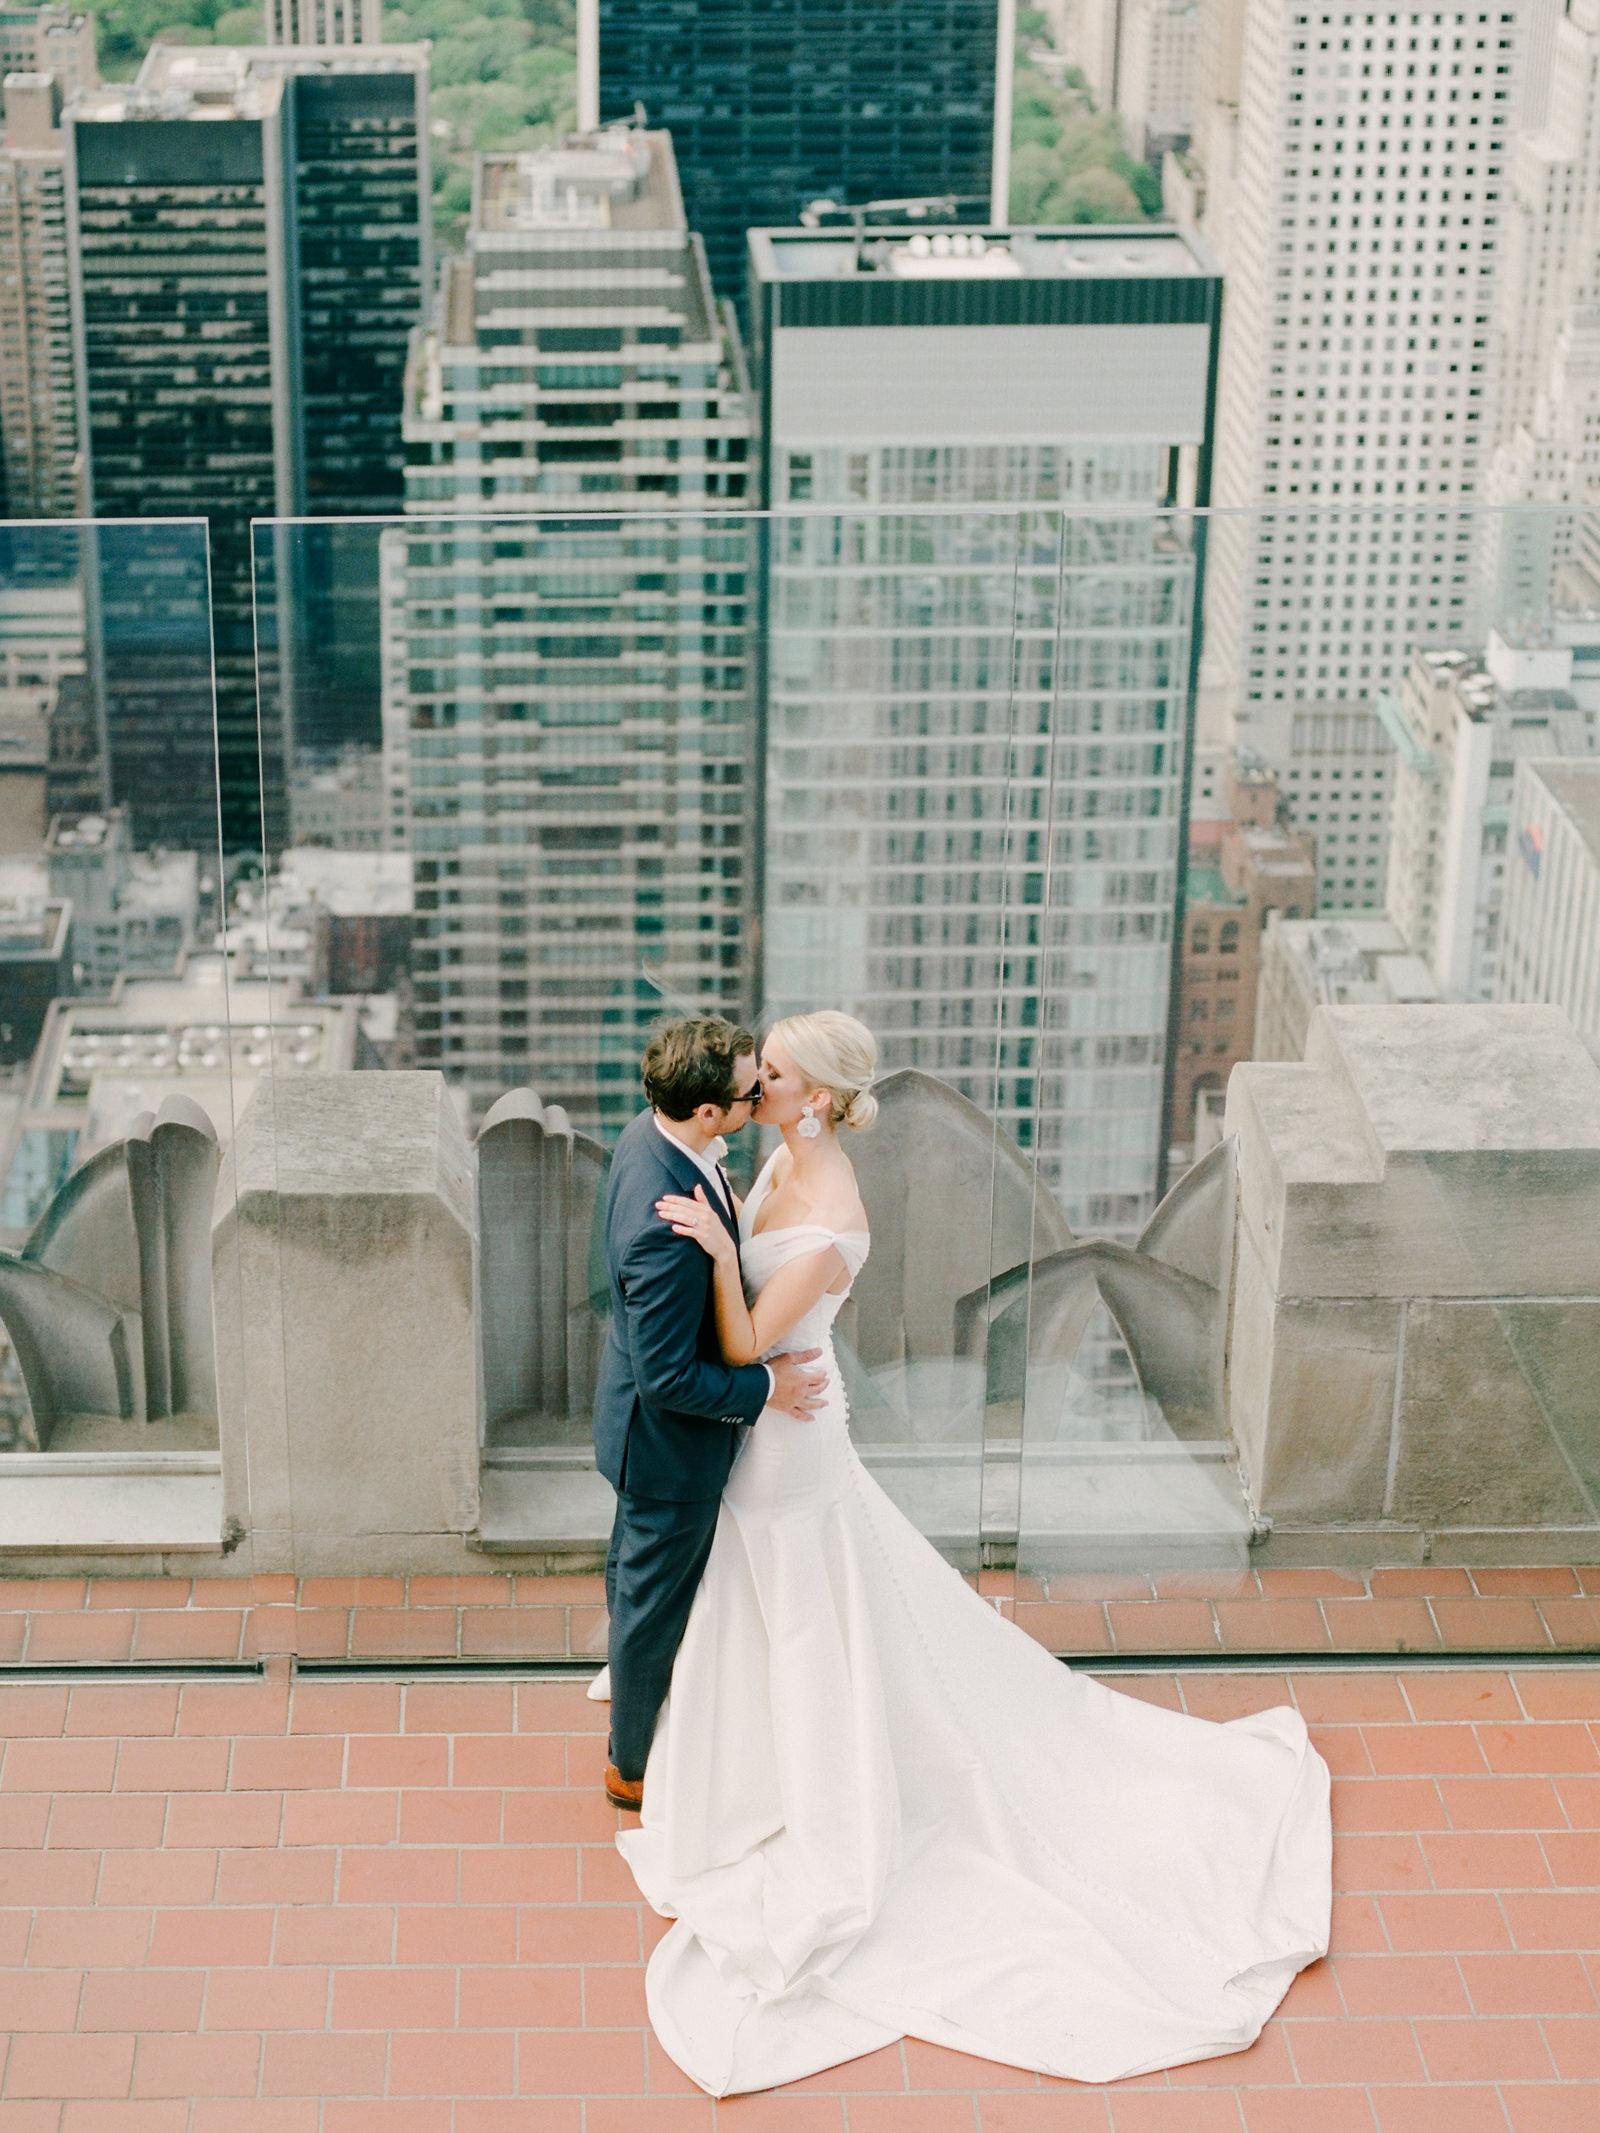 Intimate-NYC_wedding_ by Tanya Isaeva-164.jpg